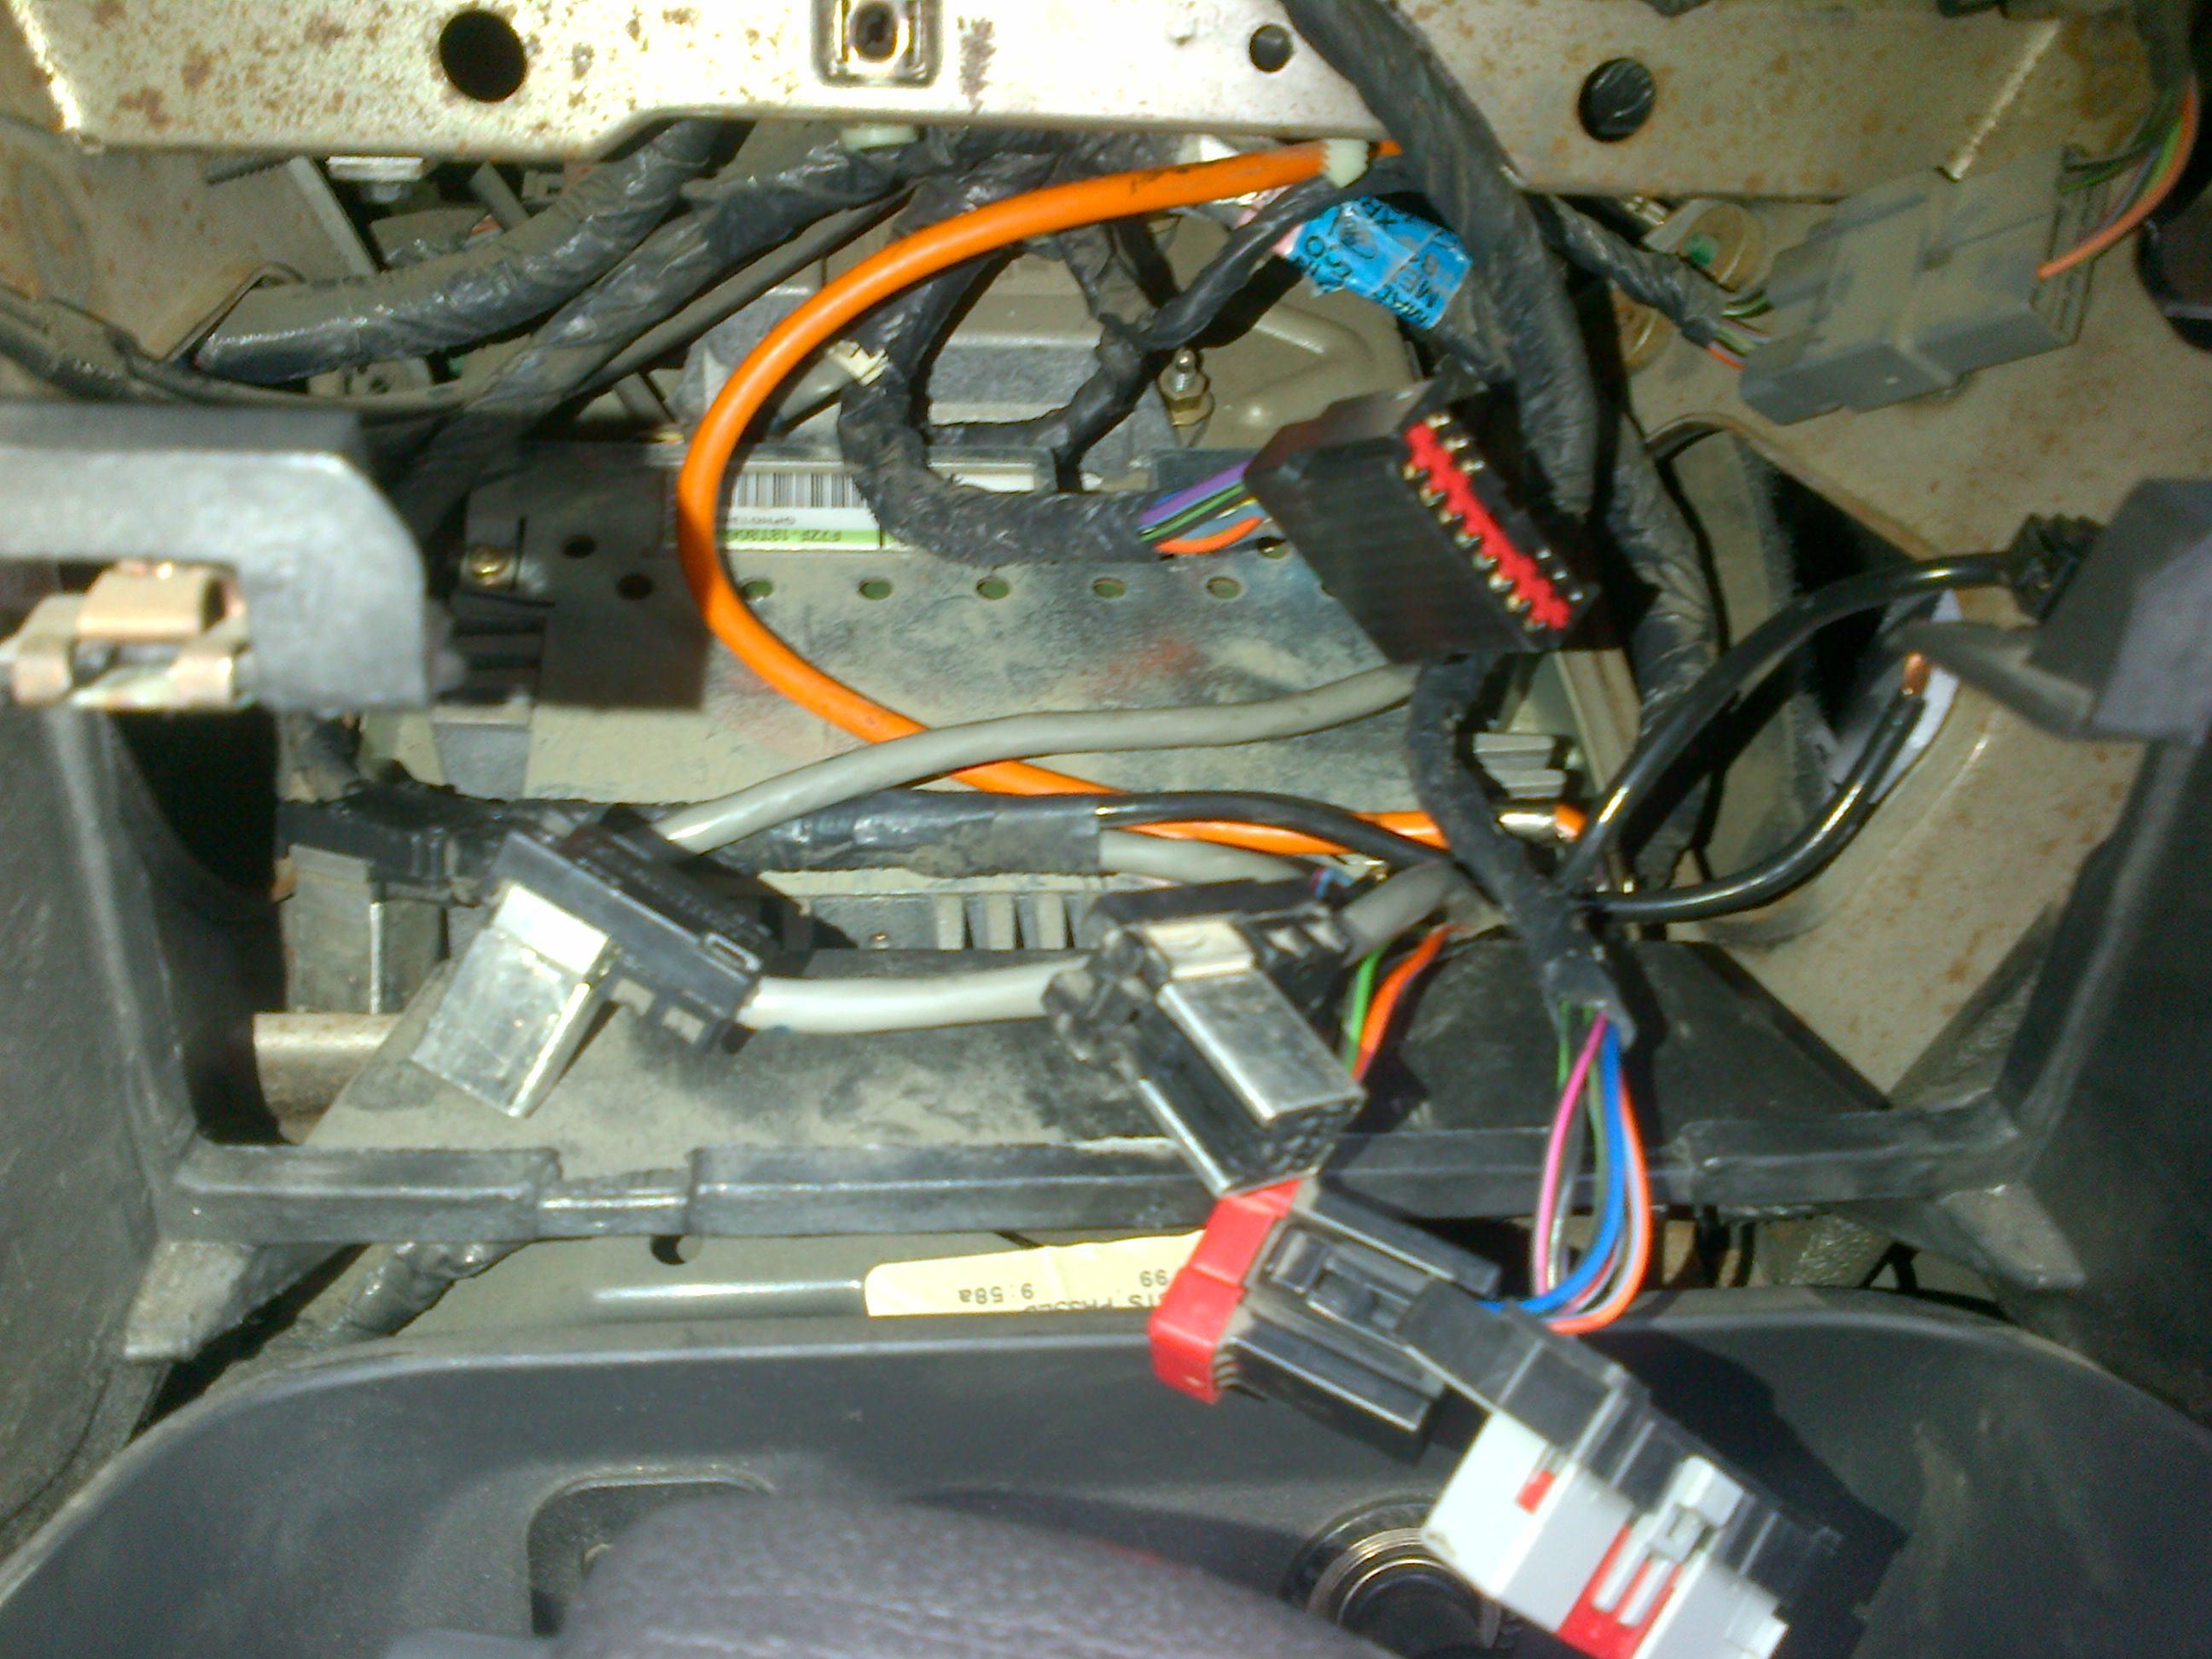 1999 Mach 460 Wiring Harness - My Wiring Diagram Mach Amp Wiring Harness Diagram on mach 460 amp schematic, mach 460 amp fuse, mach 460 sound system diagram, mach 460 head unit diagram,